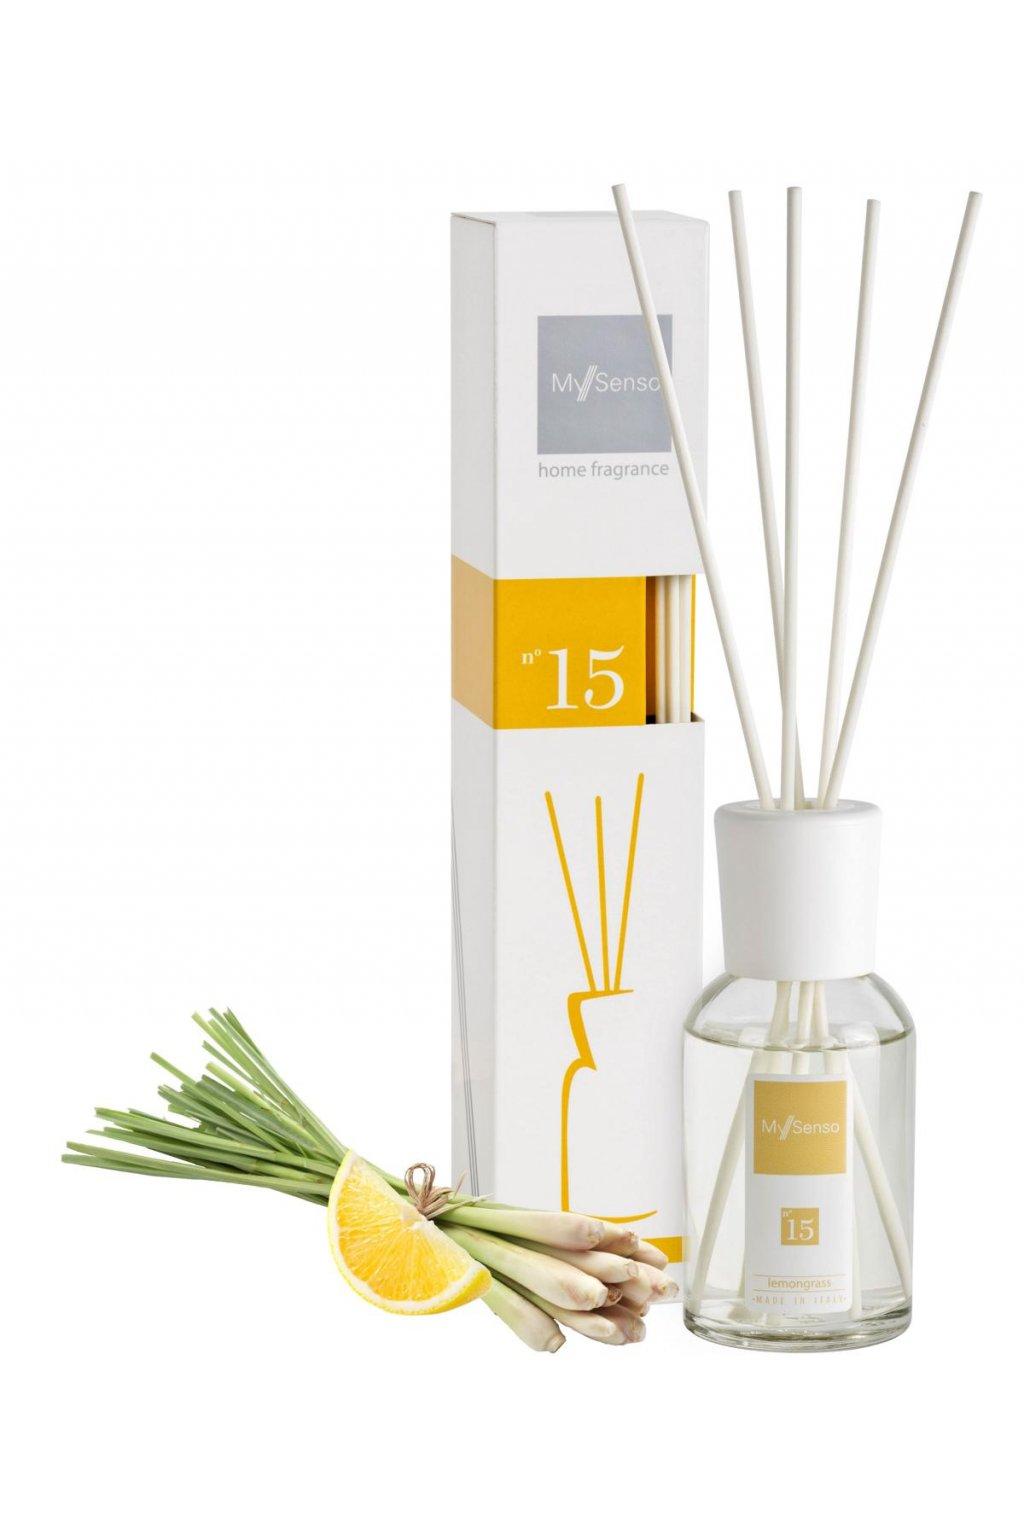 87 my senso aromaticky difuzer midi 100ml n 15 lemongrass cerstvy citron